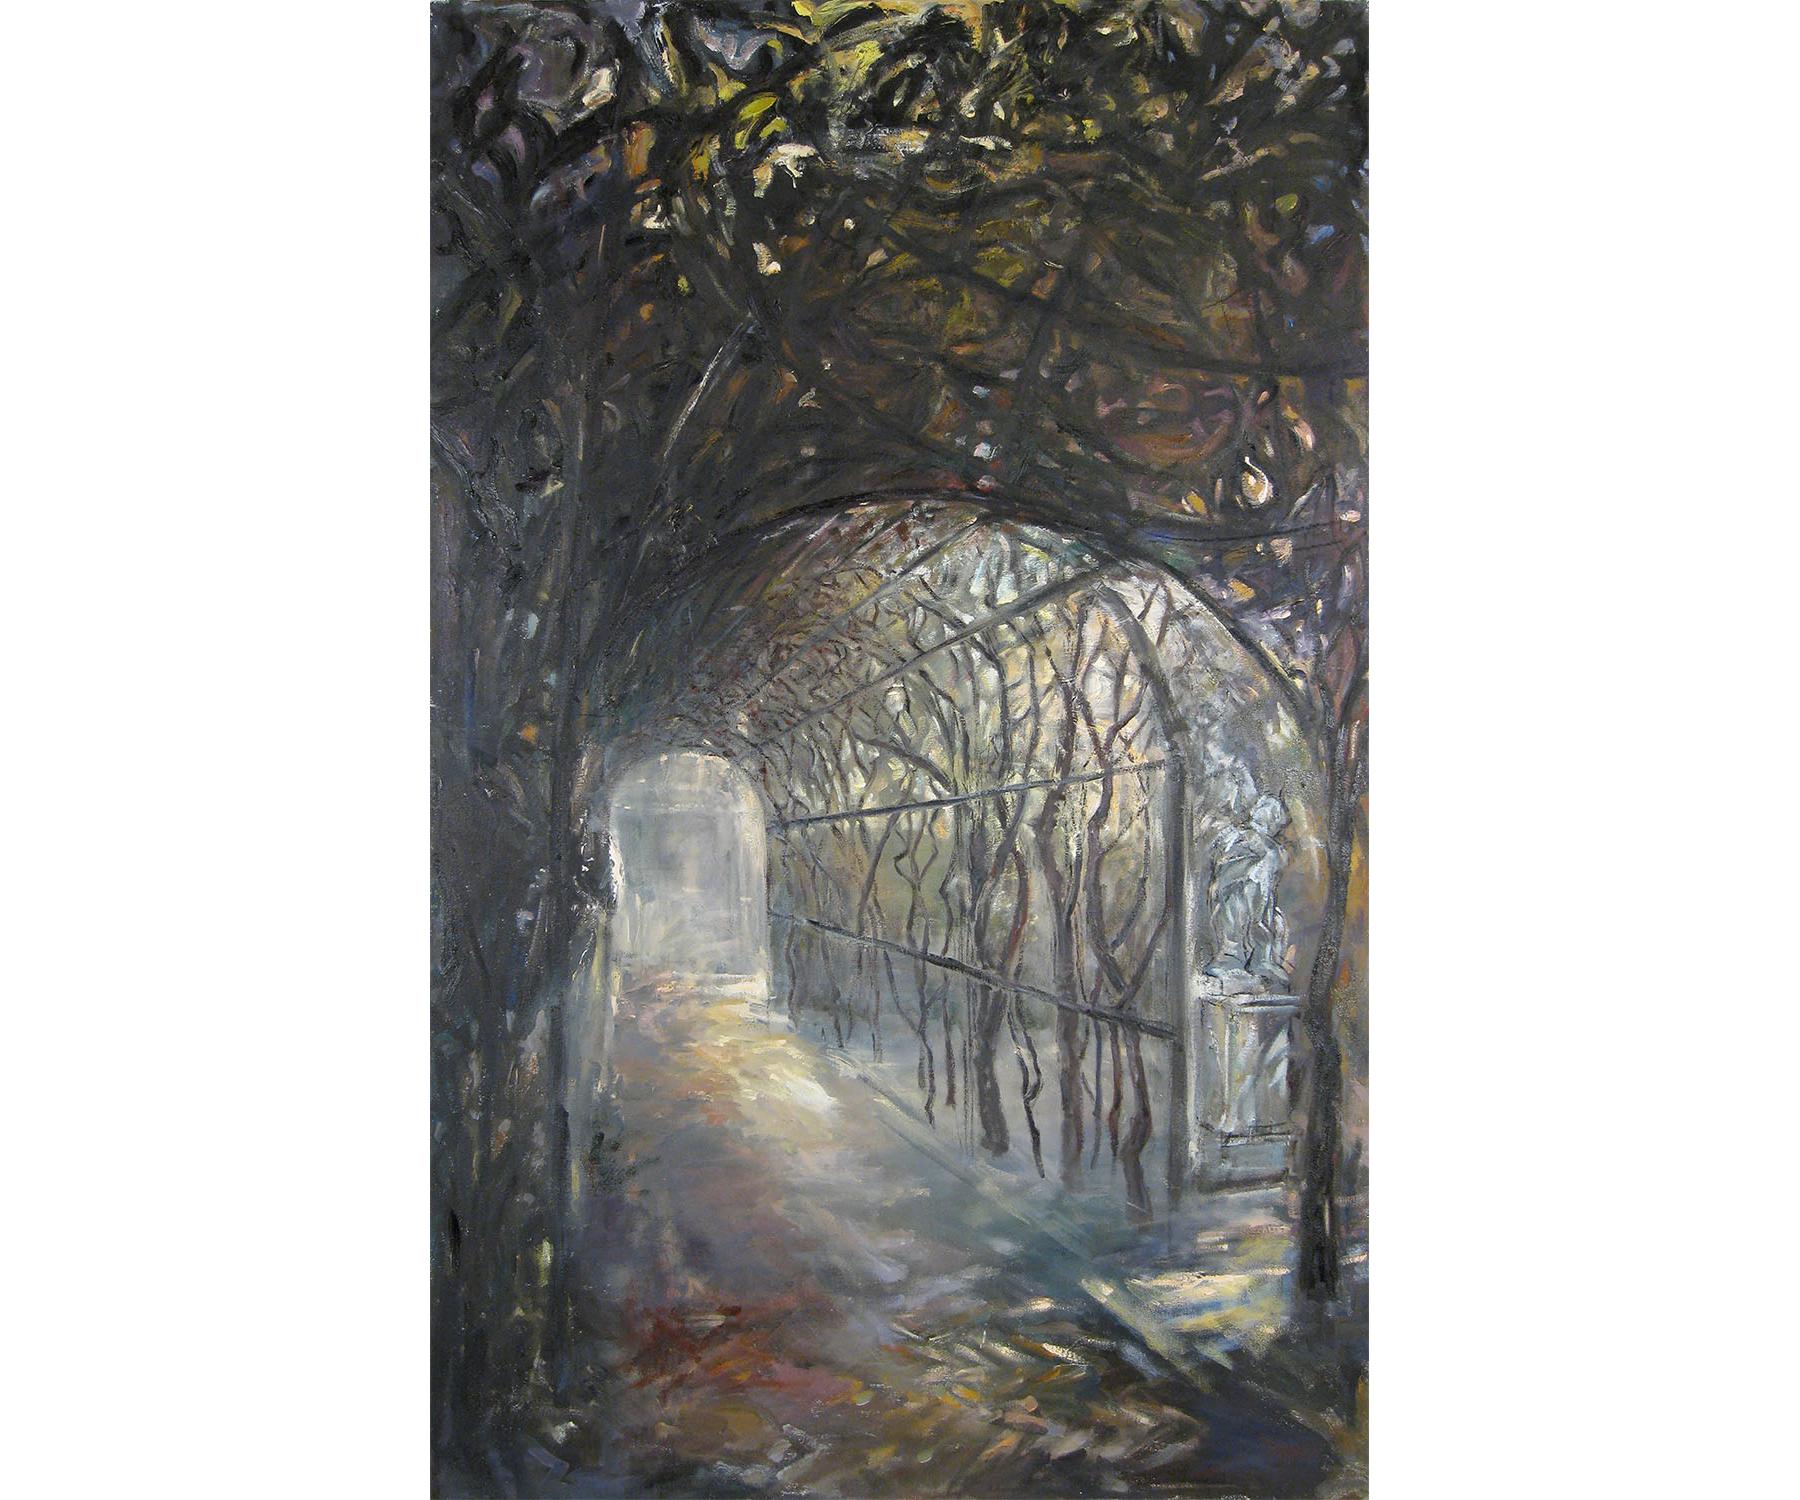 Pergola III, Oil and Acrylic on Canvas, 2015. 60 X 38